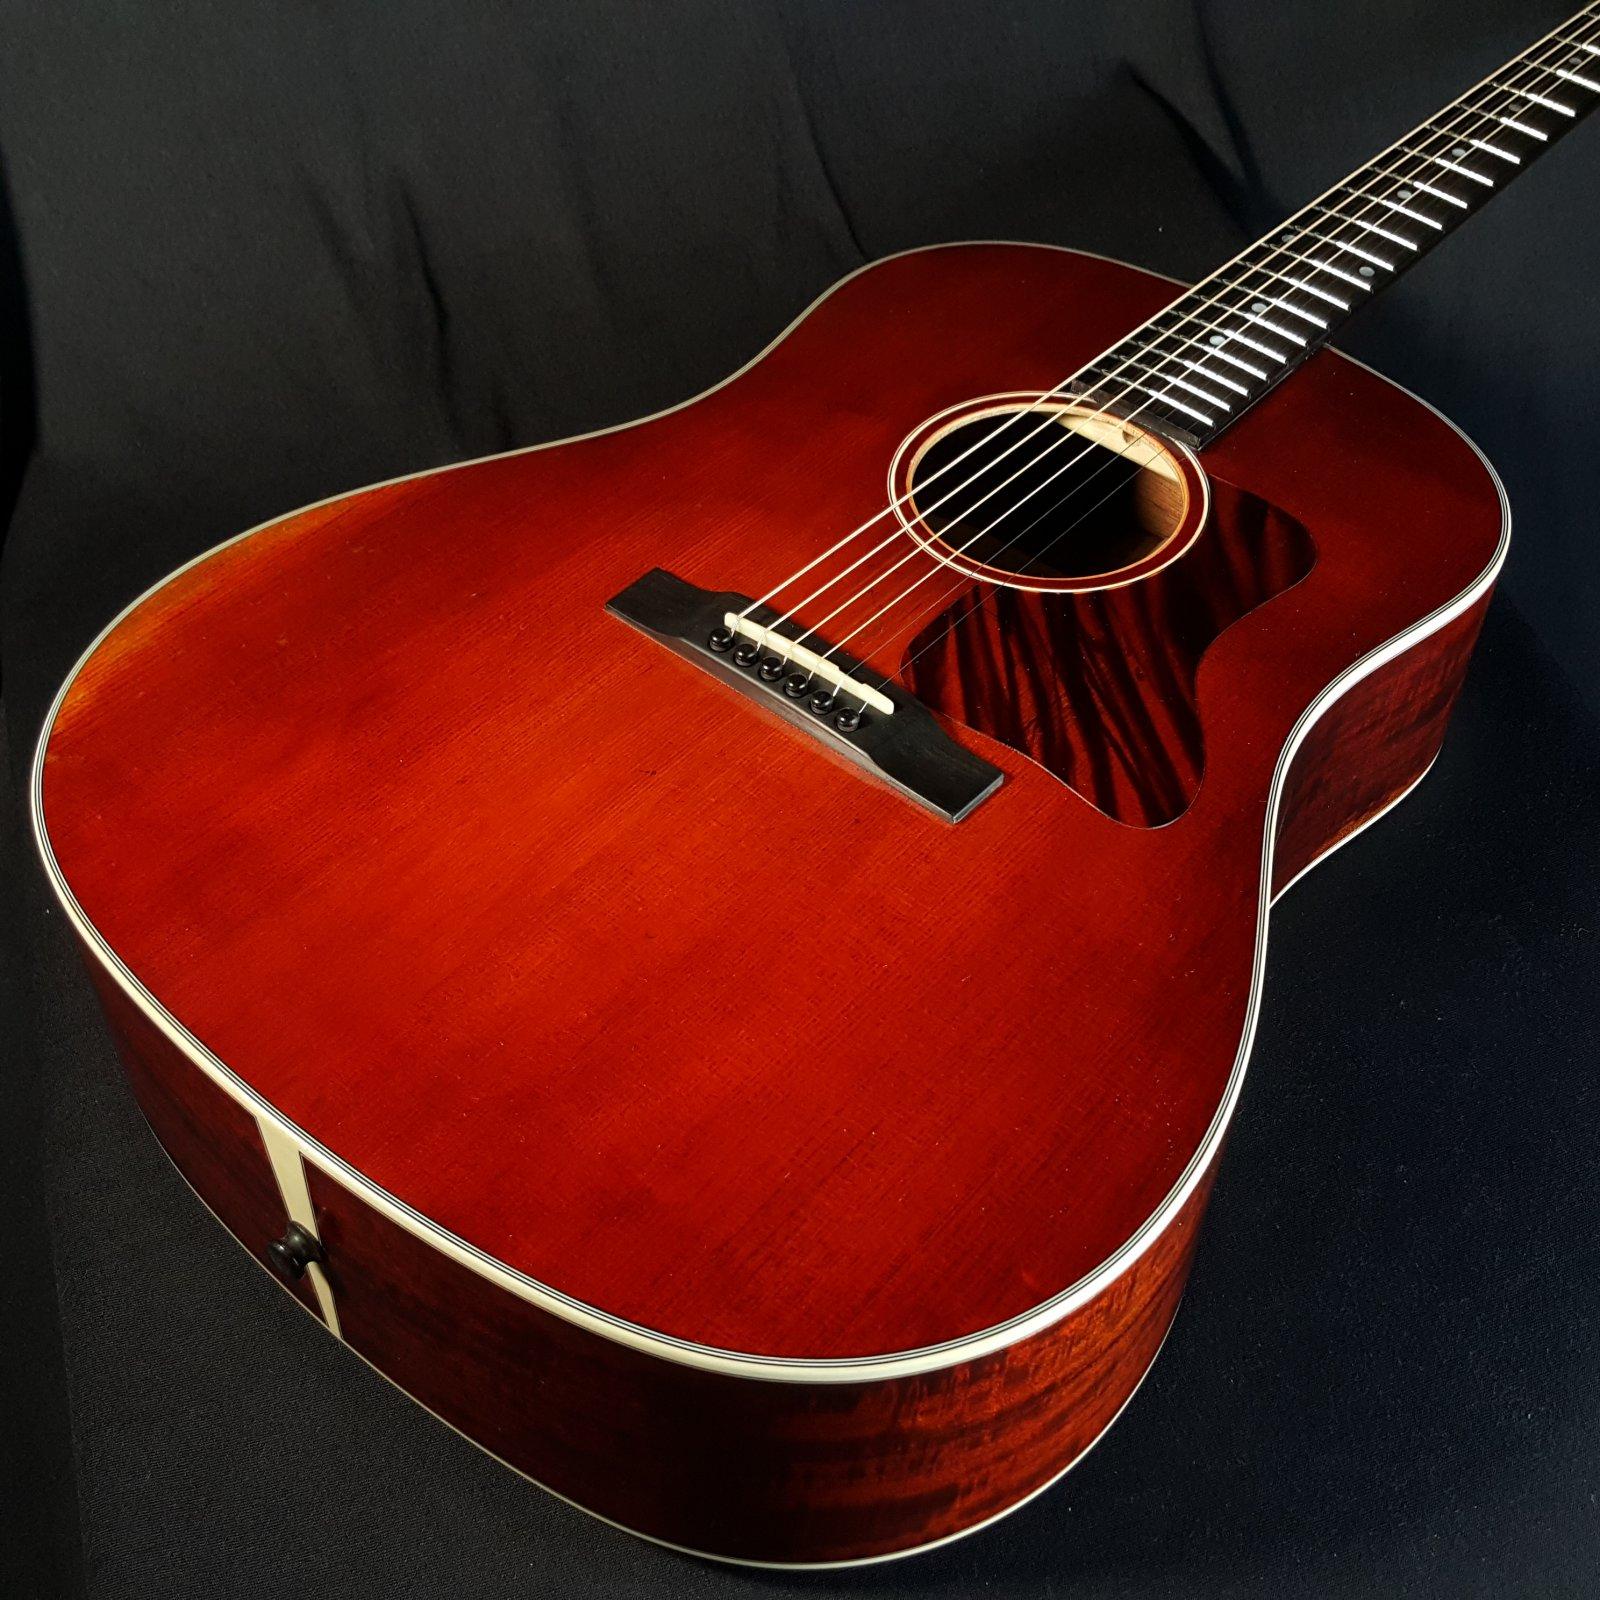 Eastman E10SS/V Antique Varnish Finish Dreadnought Acoustic Guitar